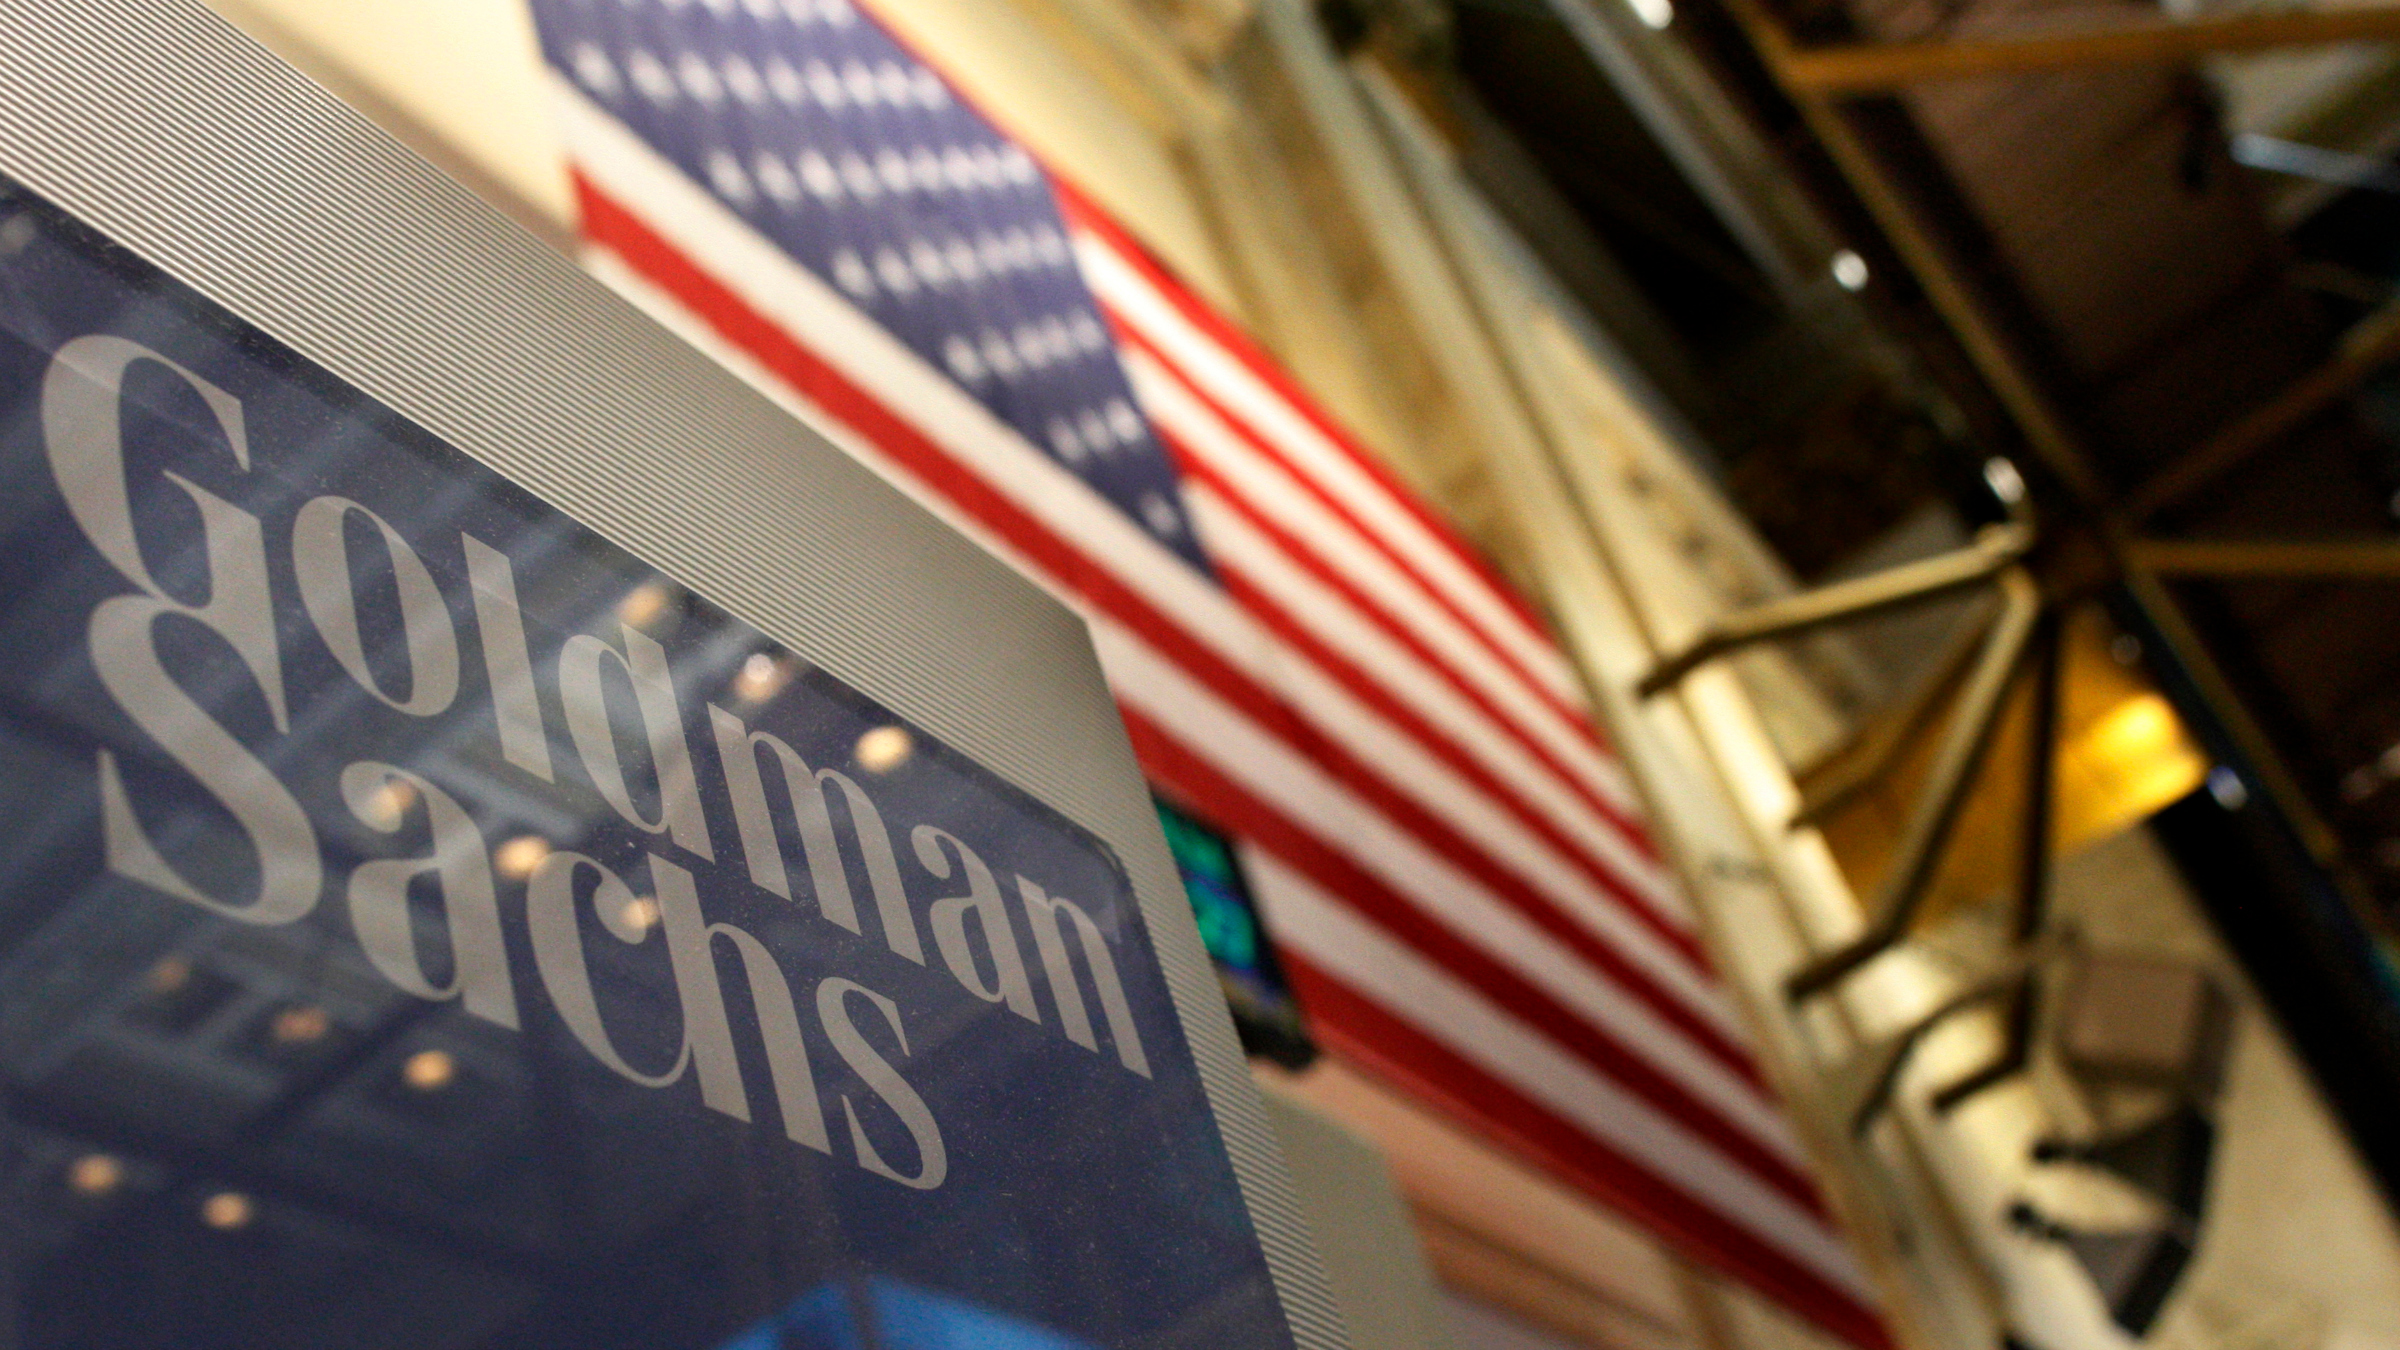 Goldman Sachs logo next to an American flag.